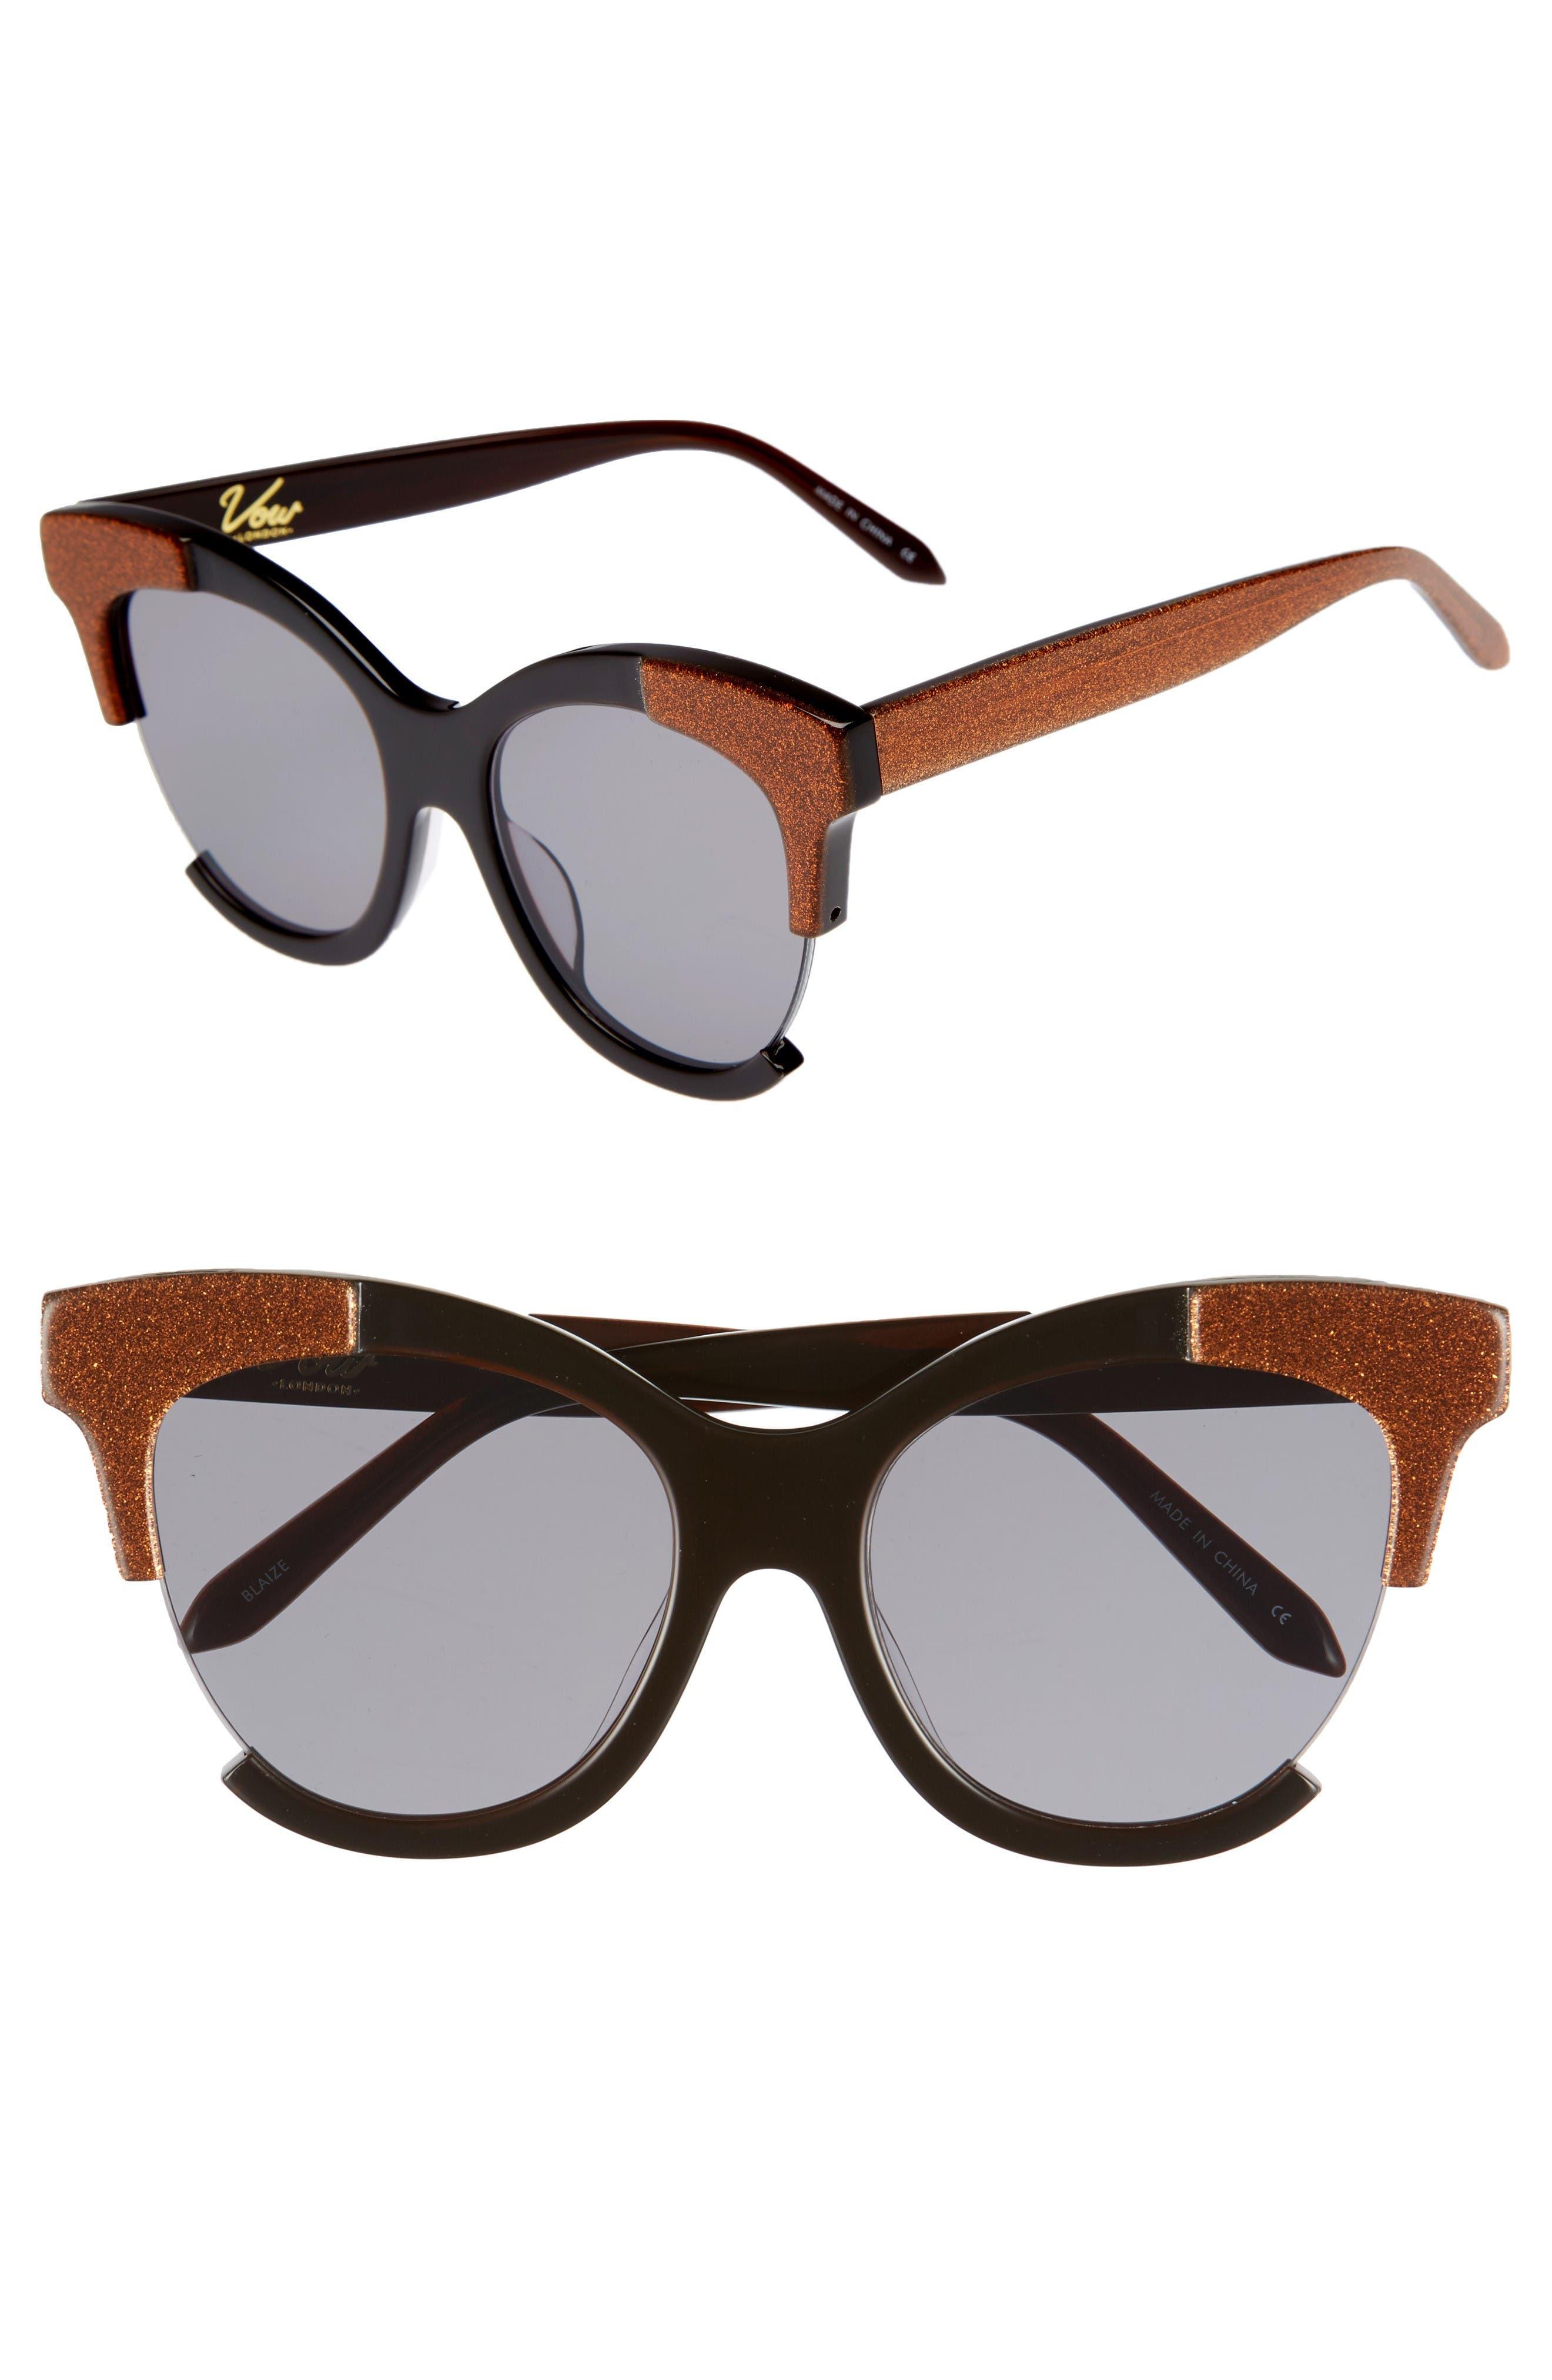 Alternate Image 1 Selected - Vow London Blaize 51mm Sunglasses